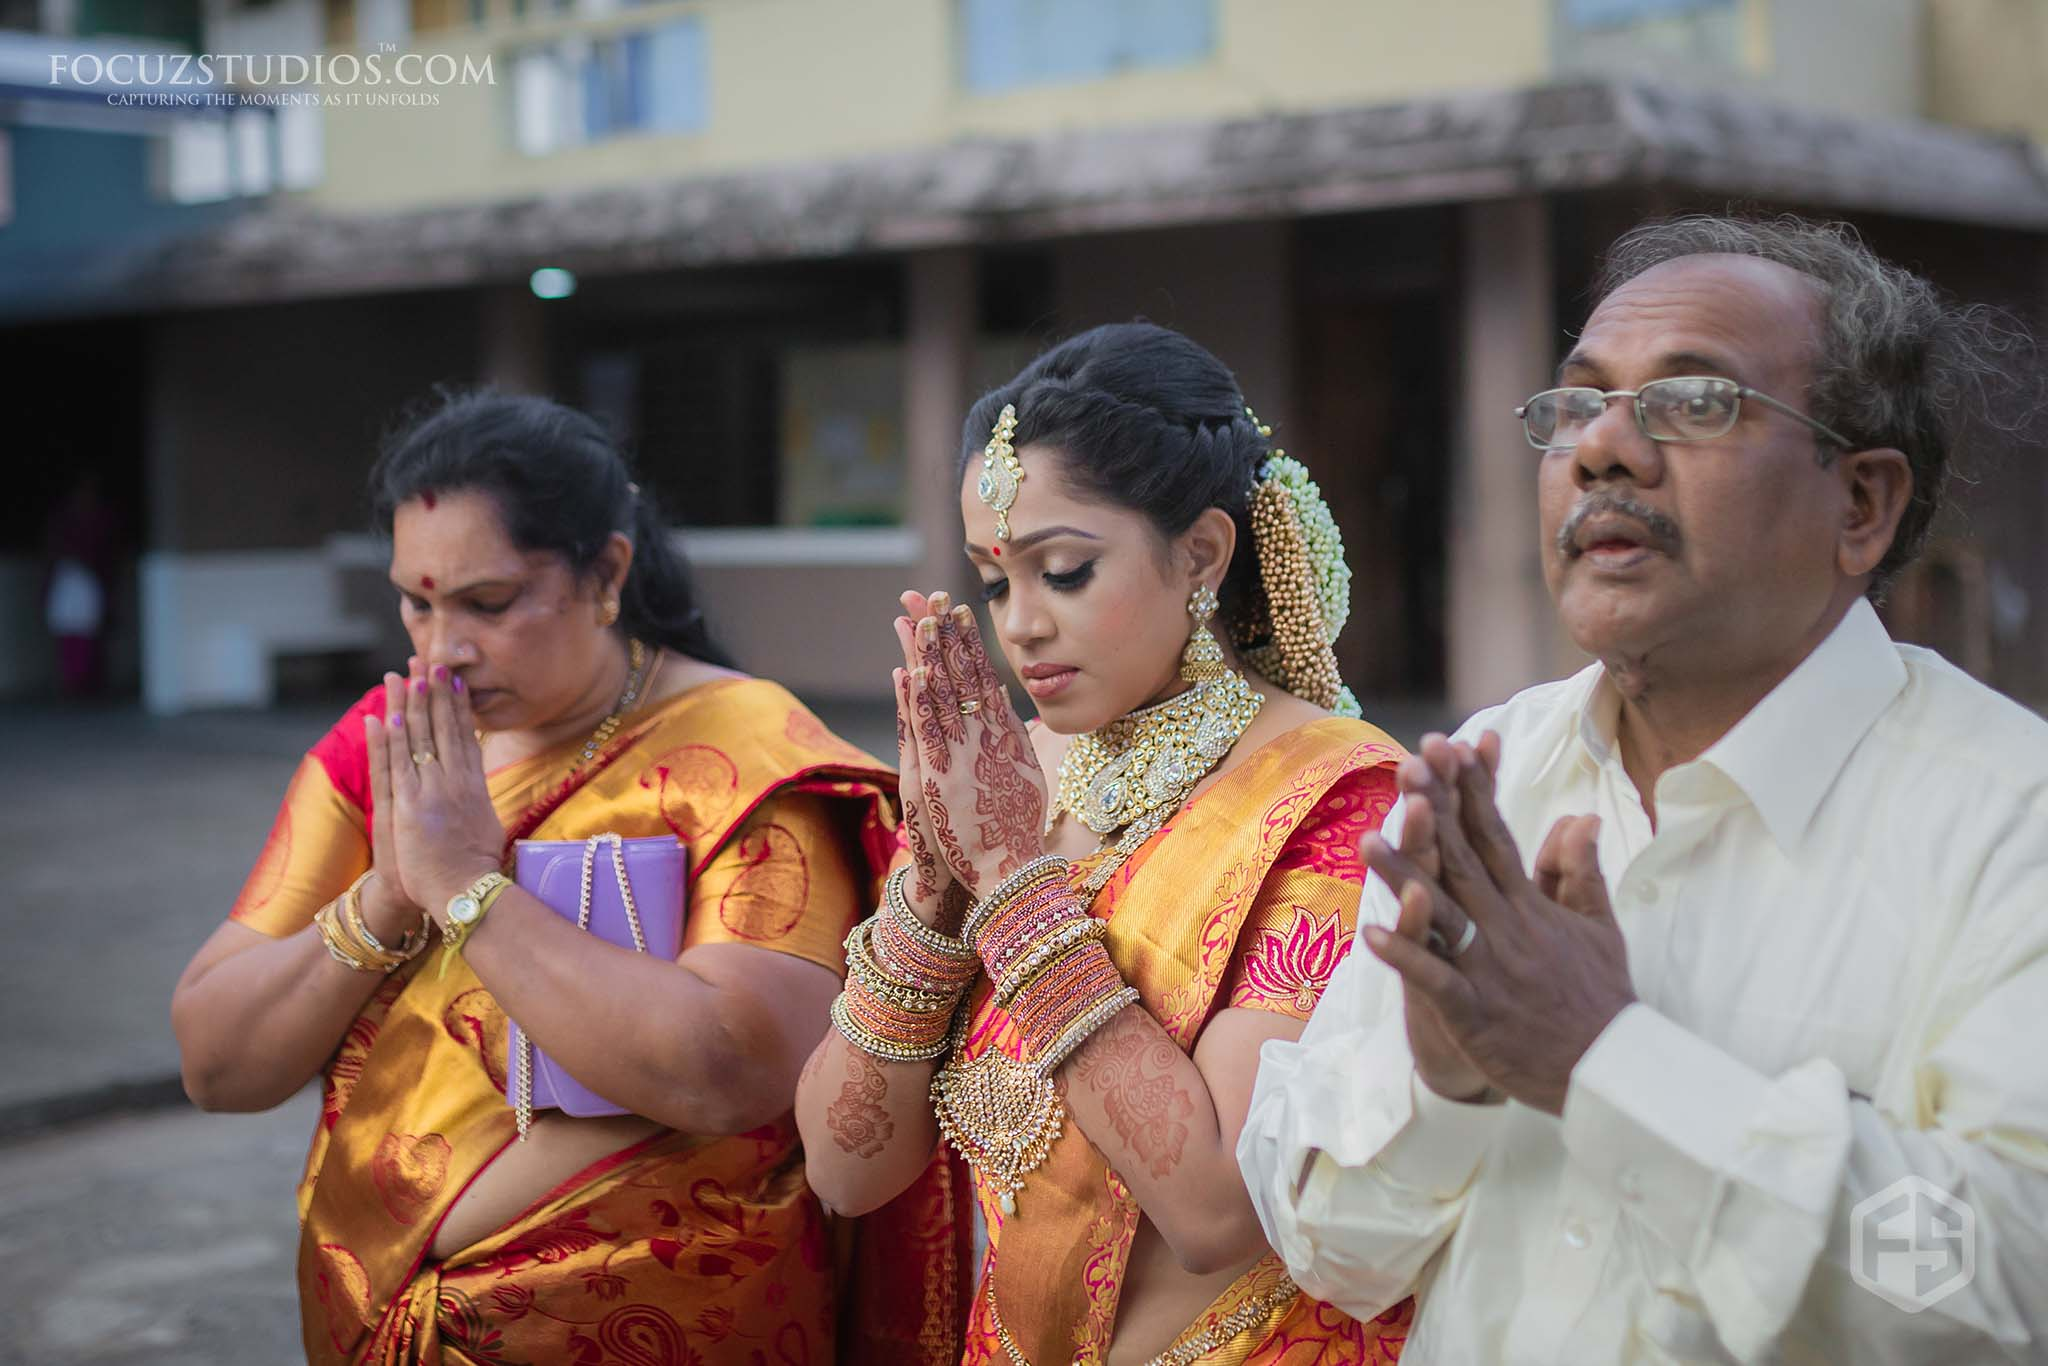 A Beautiful Srilankan Wedding at Colombo-2